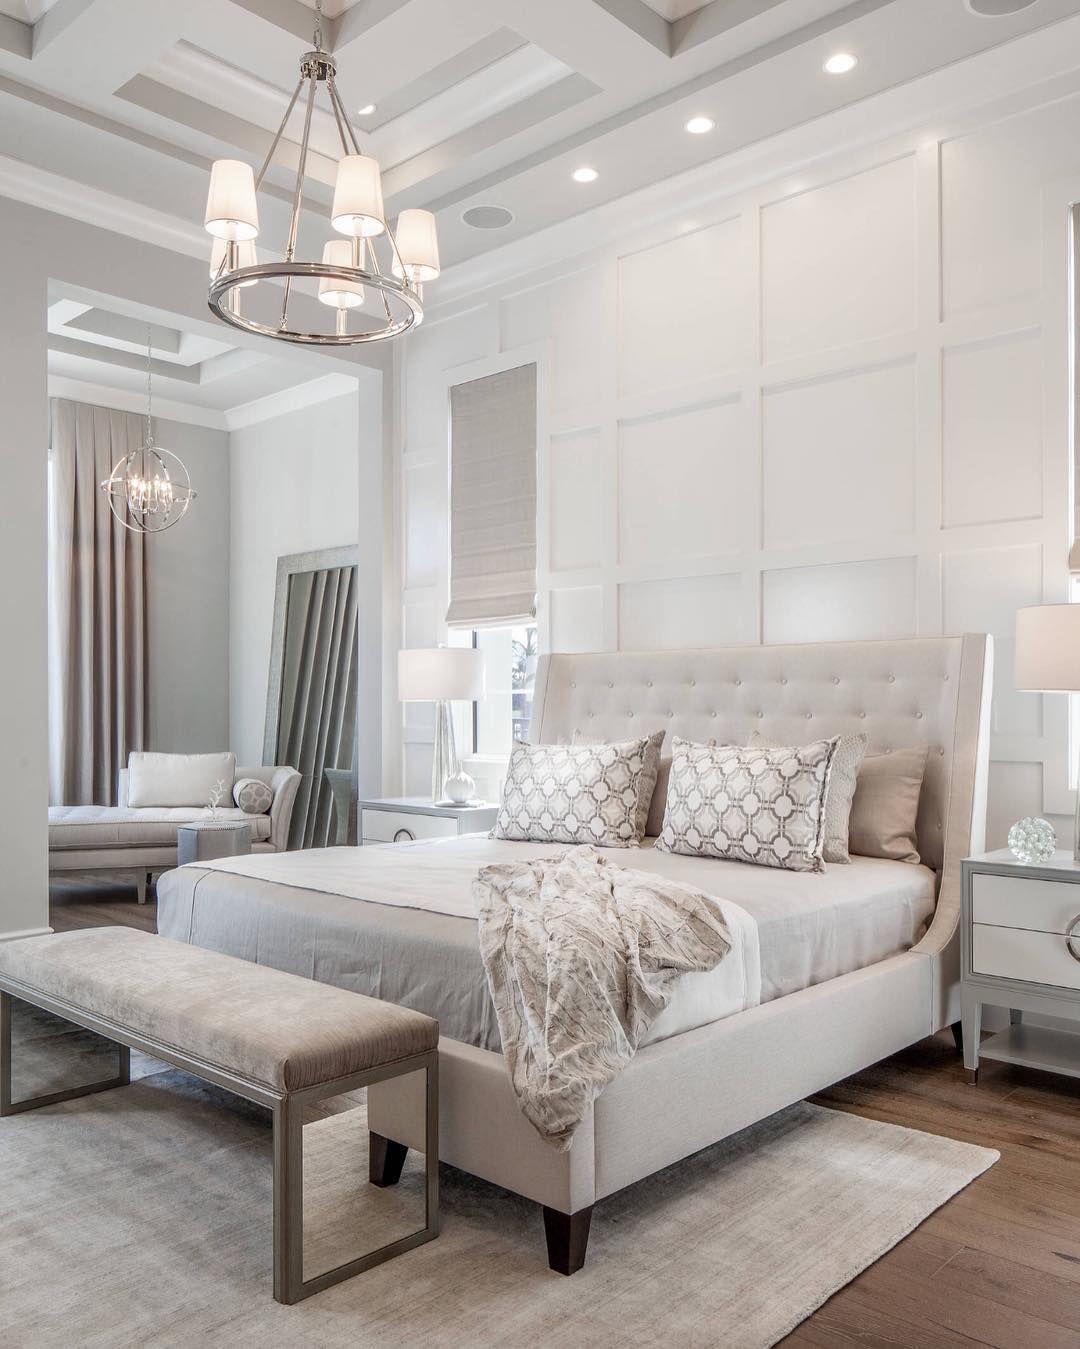 Classic Transitional Bedroom Contemporary Bedroom Contemporary Bedroom Design Contemporary Master Bedroom Design Ideas